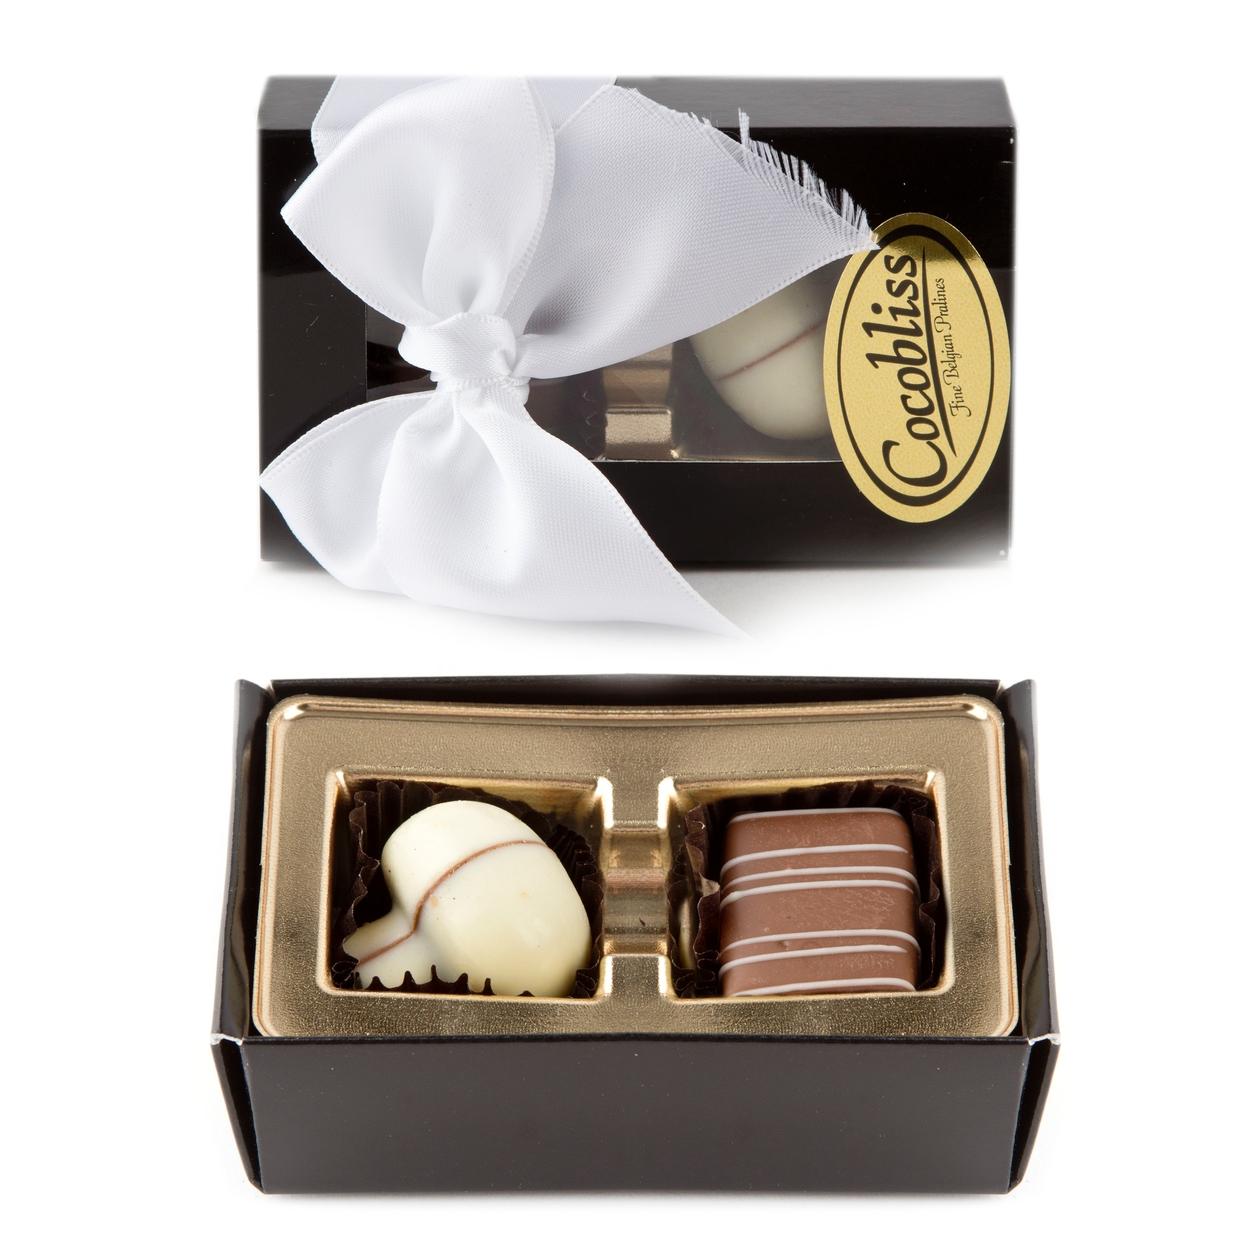 Premium Belgium Truffles Black Box - 2 PC Box • Chocolate Gift Boxes ...